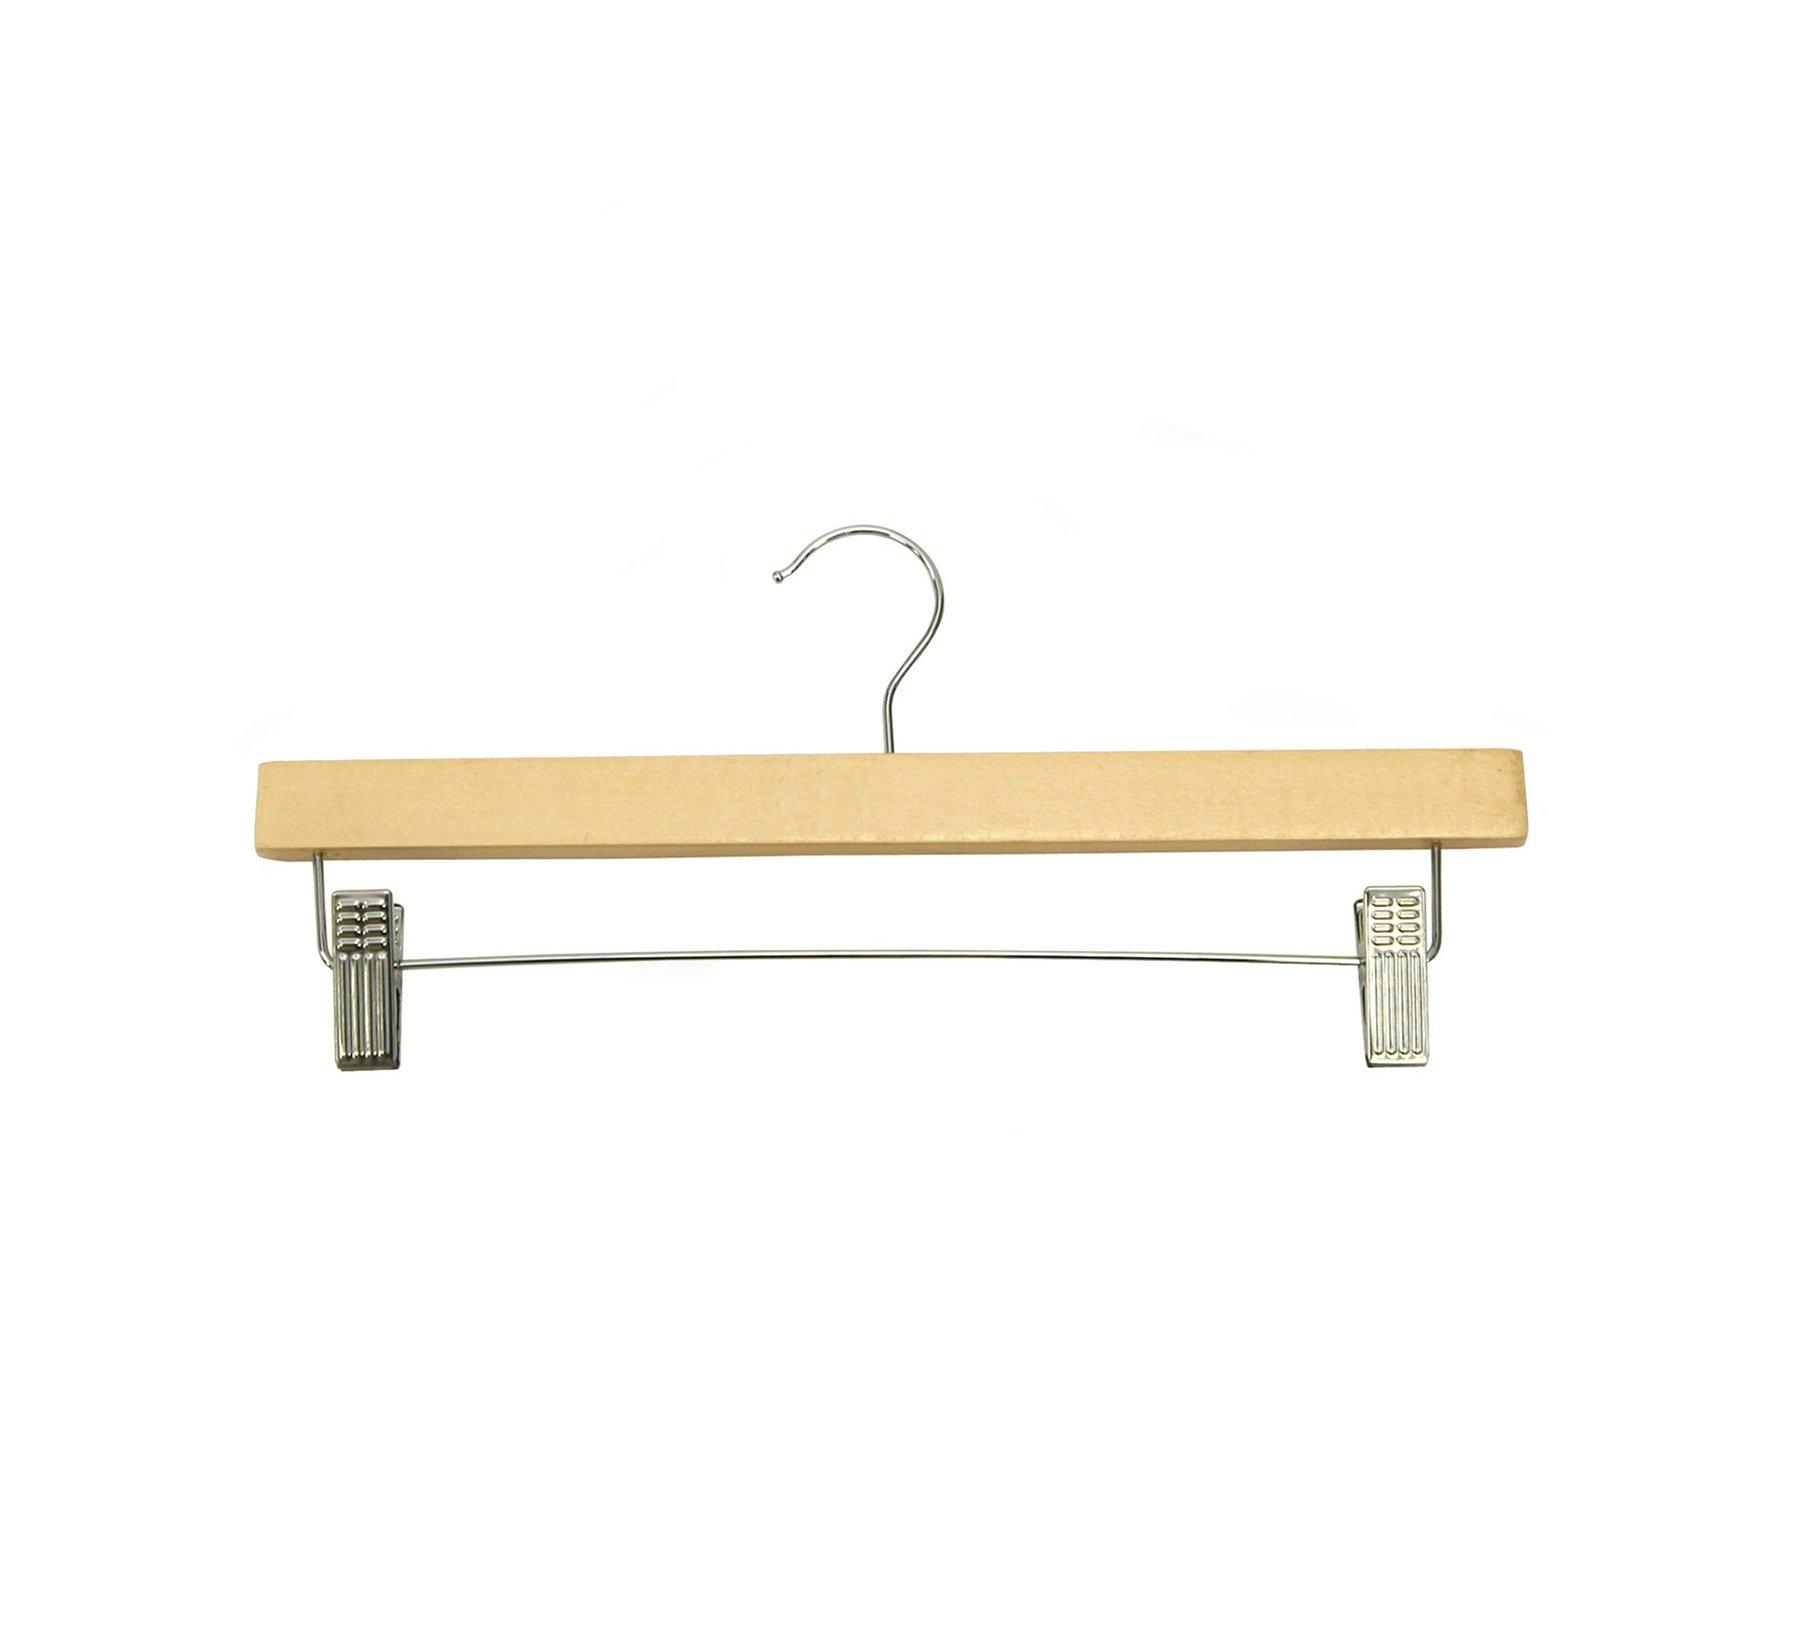 Newtech Display HWB-14/MA Pants/Skirt Wood Hanger, Maple (Pack of 100)